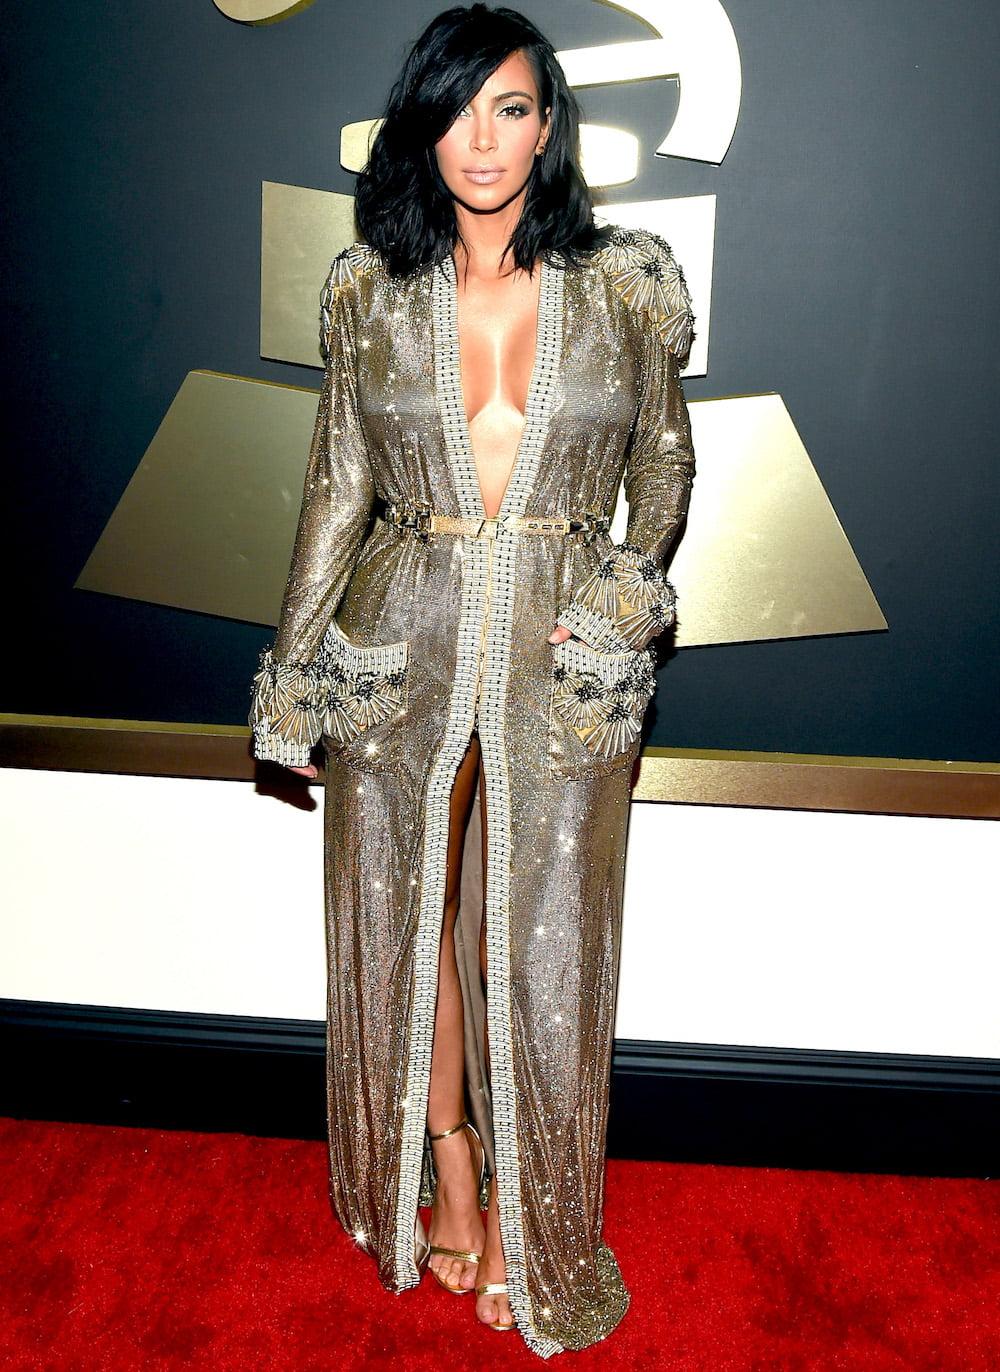 Ким Кардашьян Уэст (Kim Kardashian West)